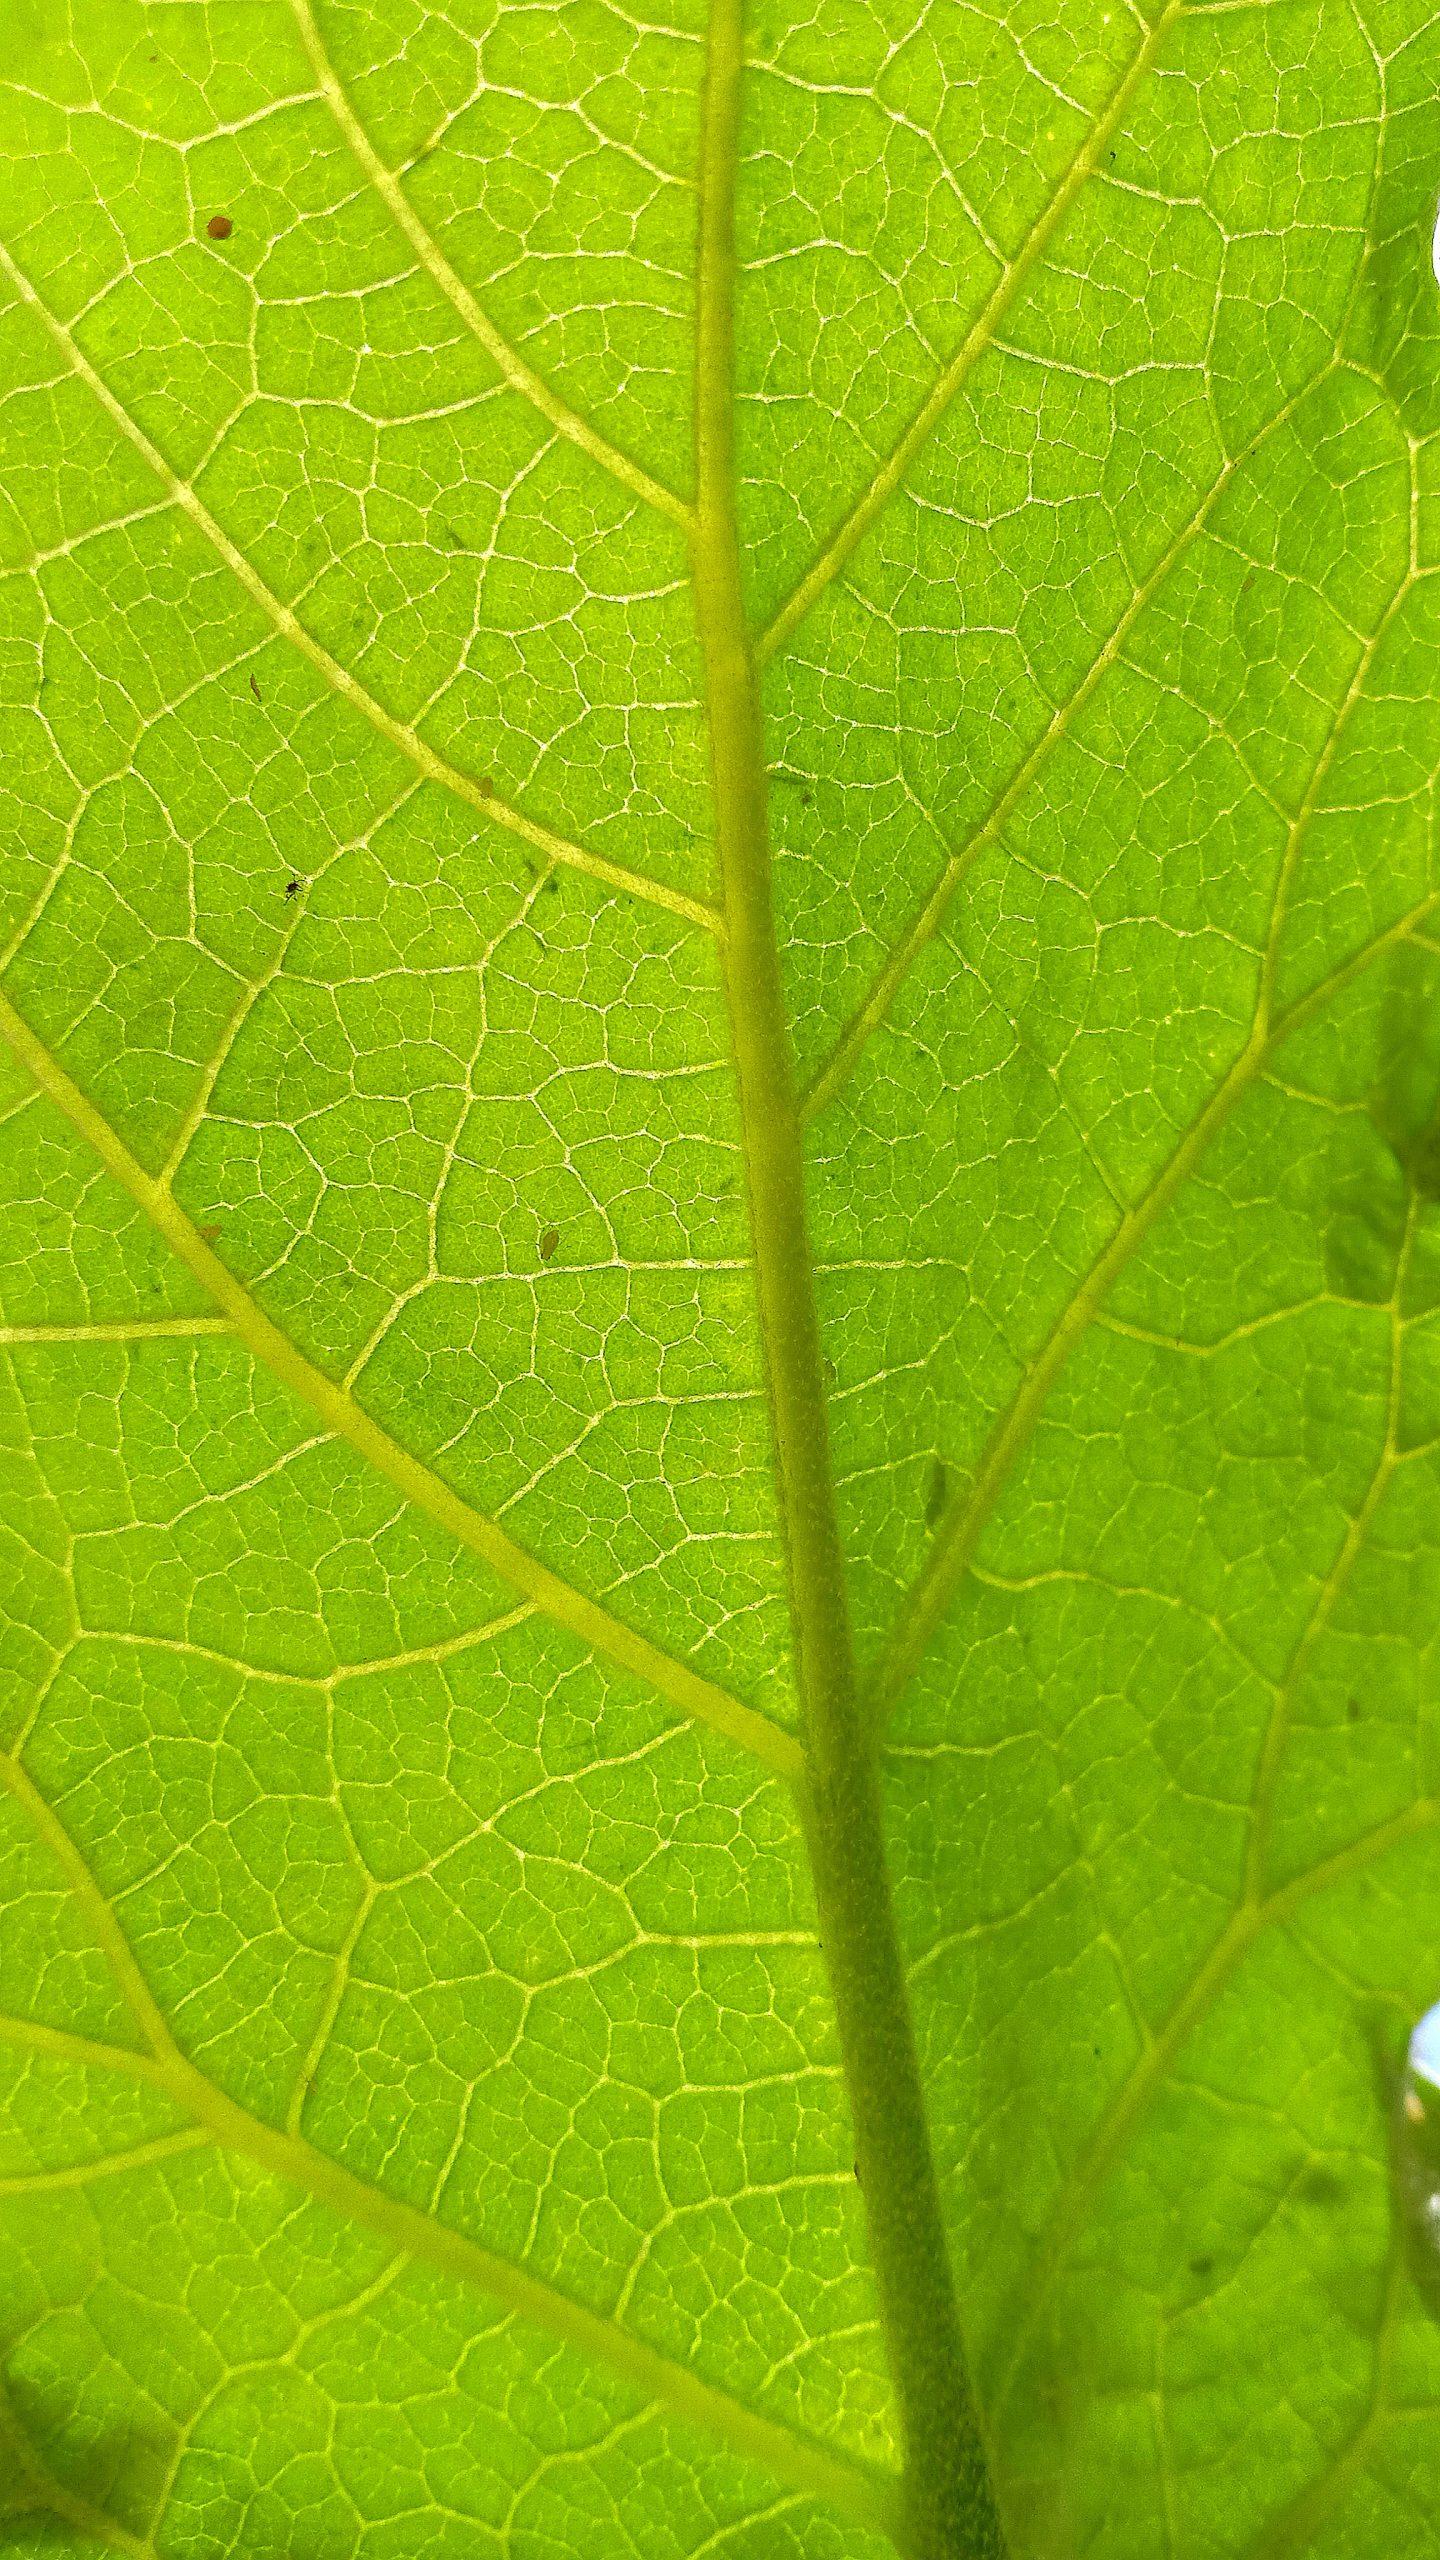 Closeup of a green leaf